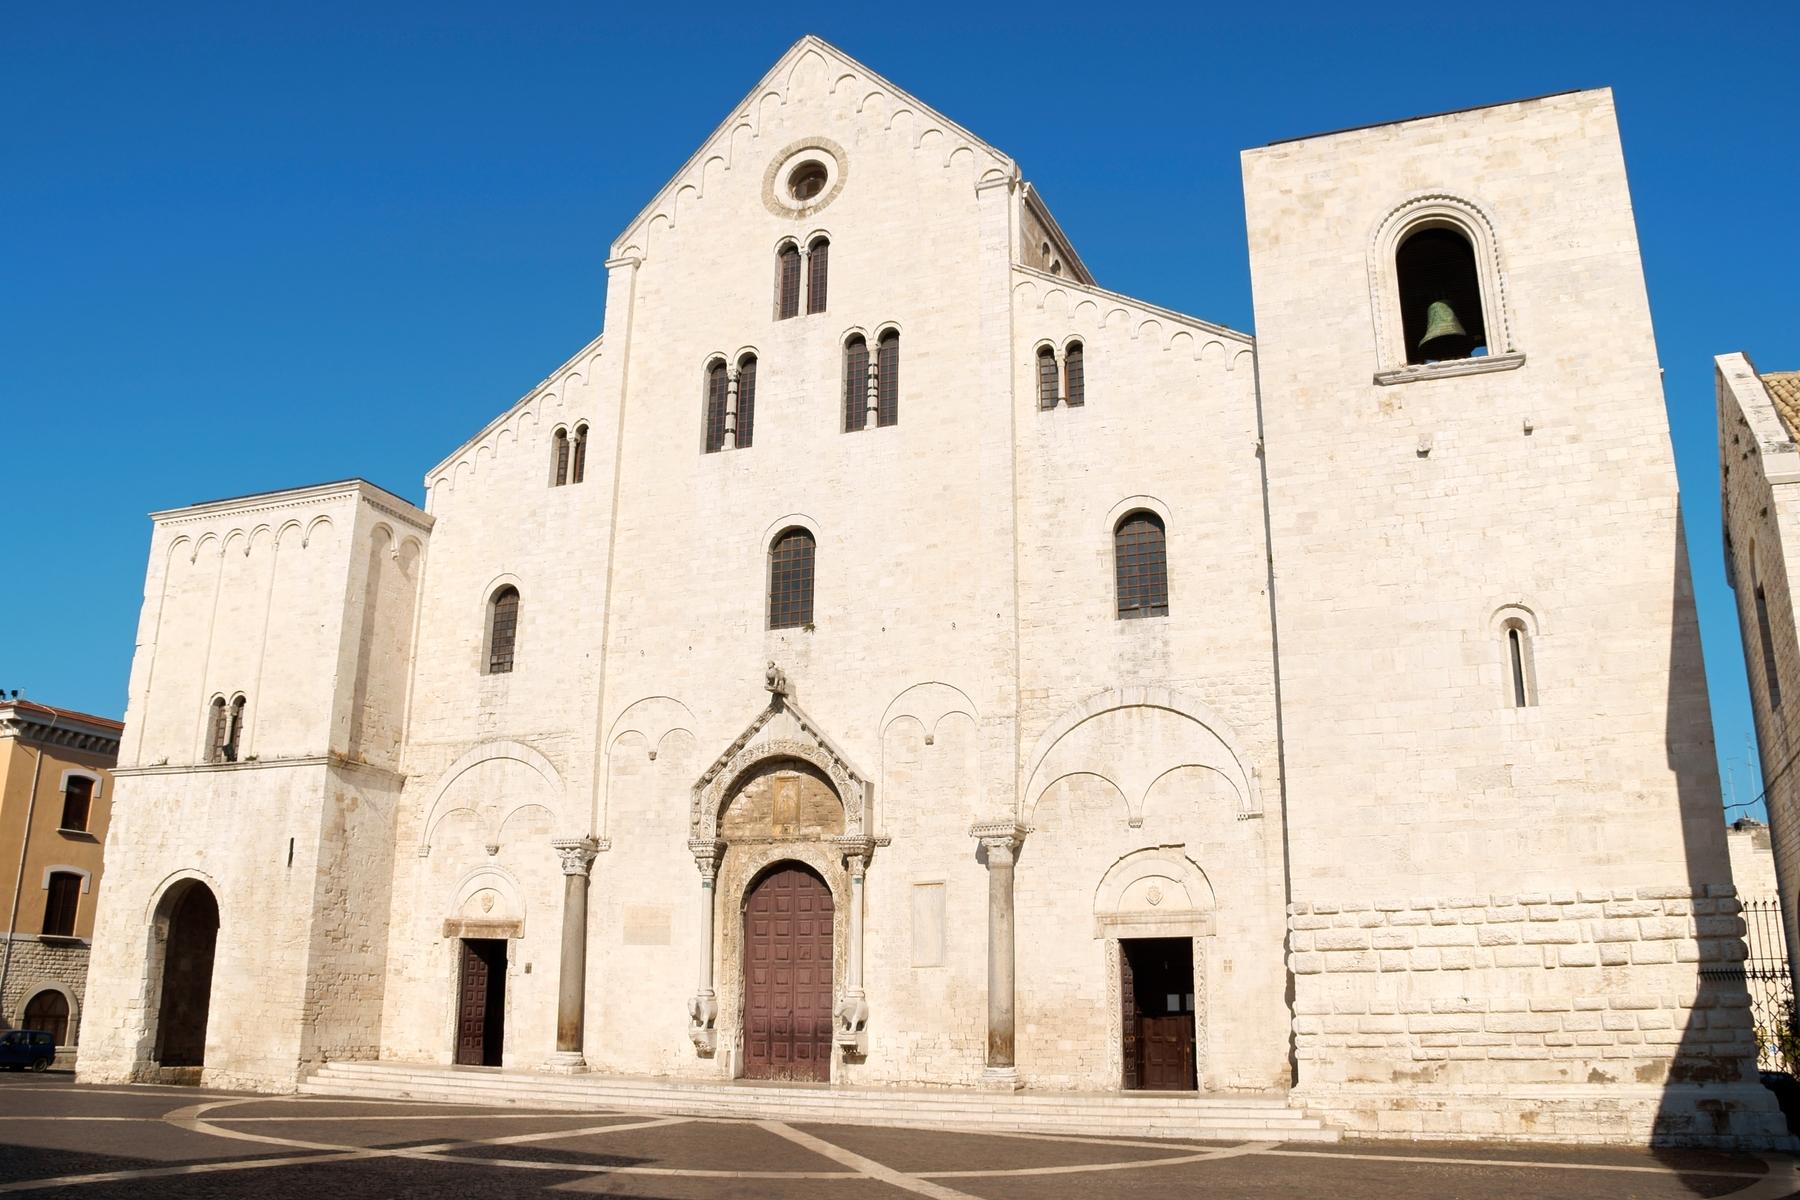 S.Nicola di Bari